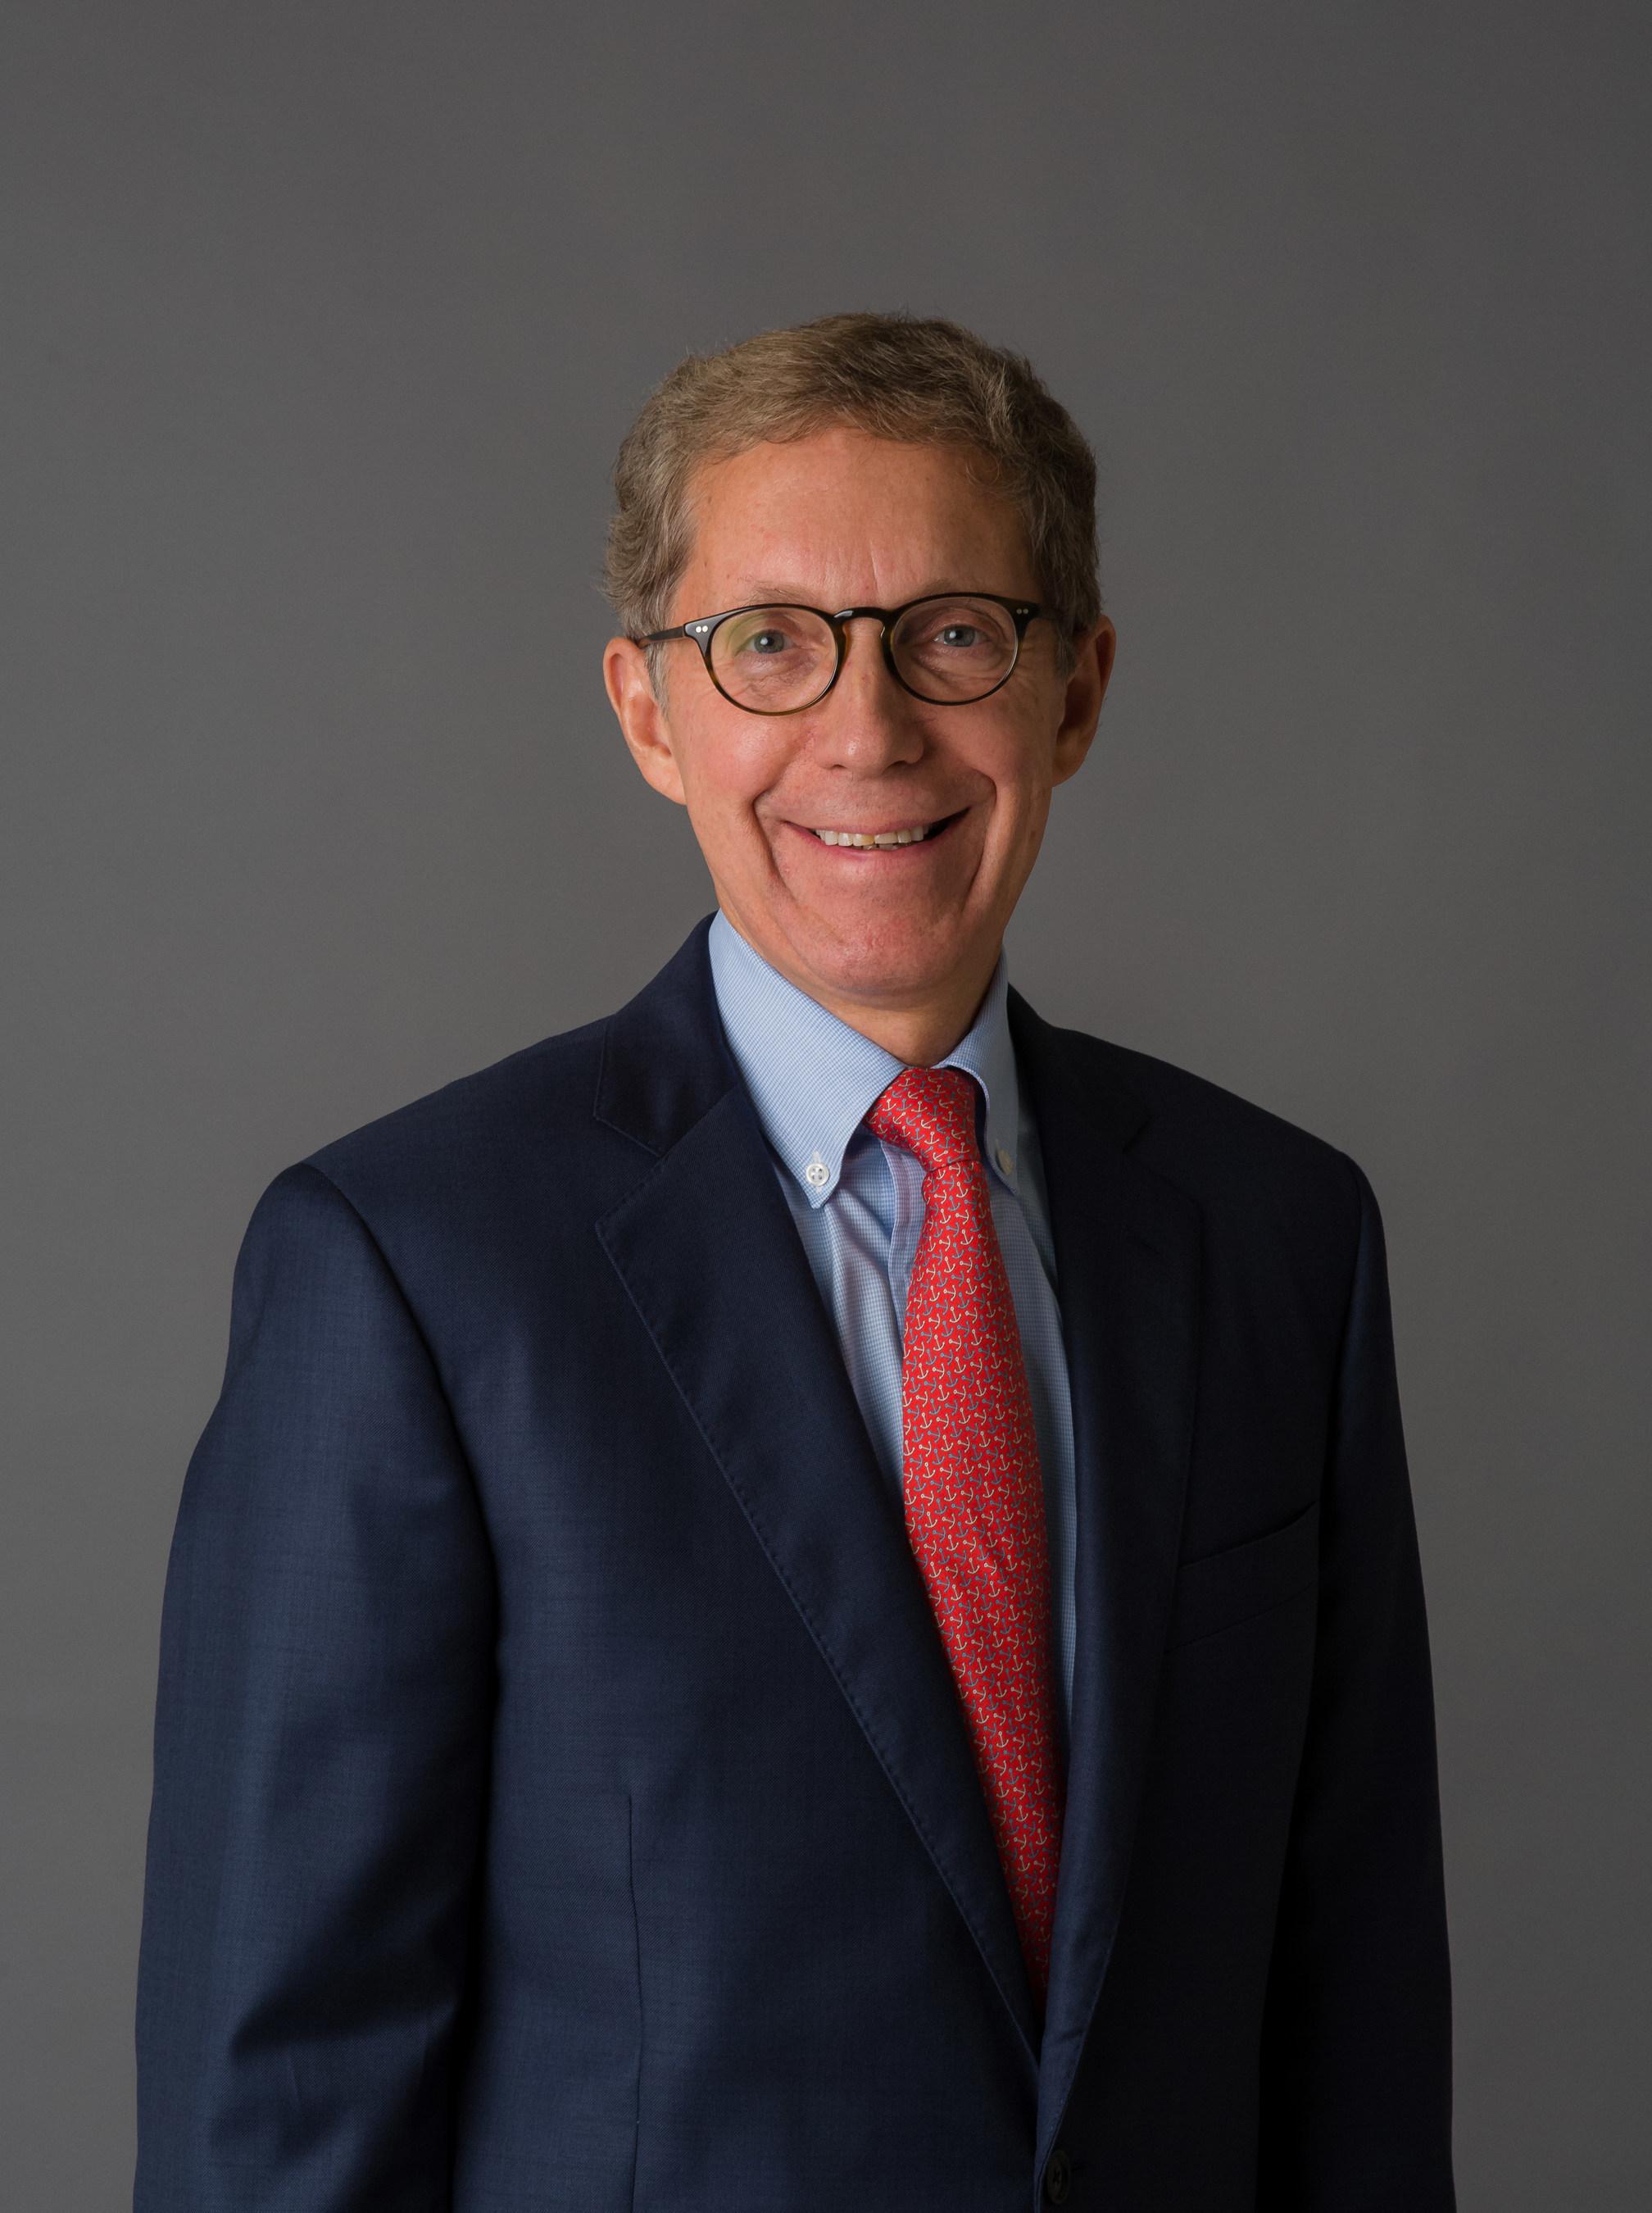 William H. Woolverton, Managing Director - U.S. and Head of U.S. Legal